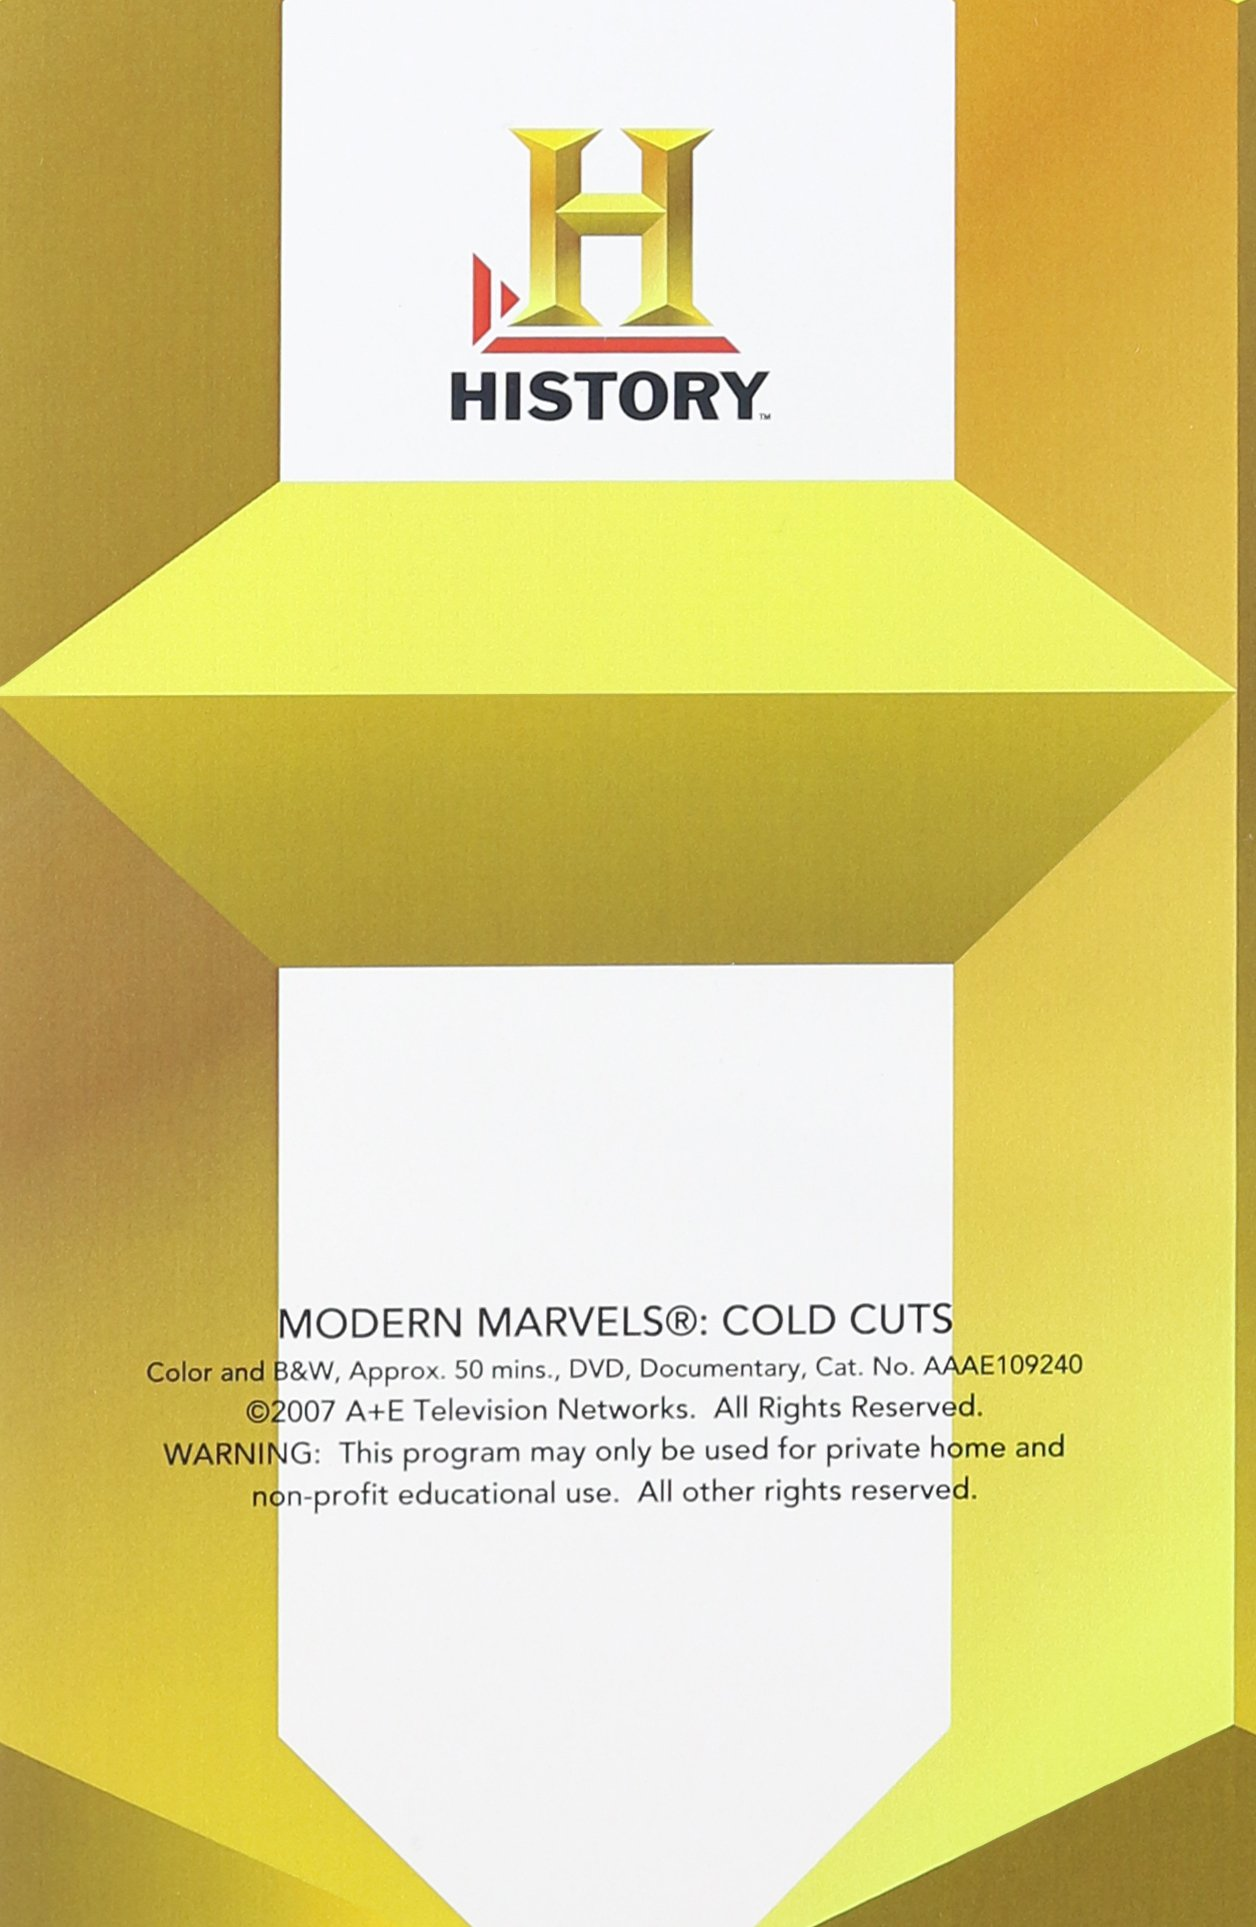 Modern Marvels: Cold Cuts